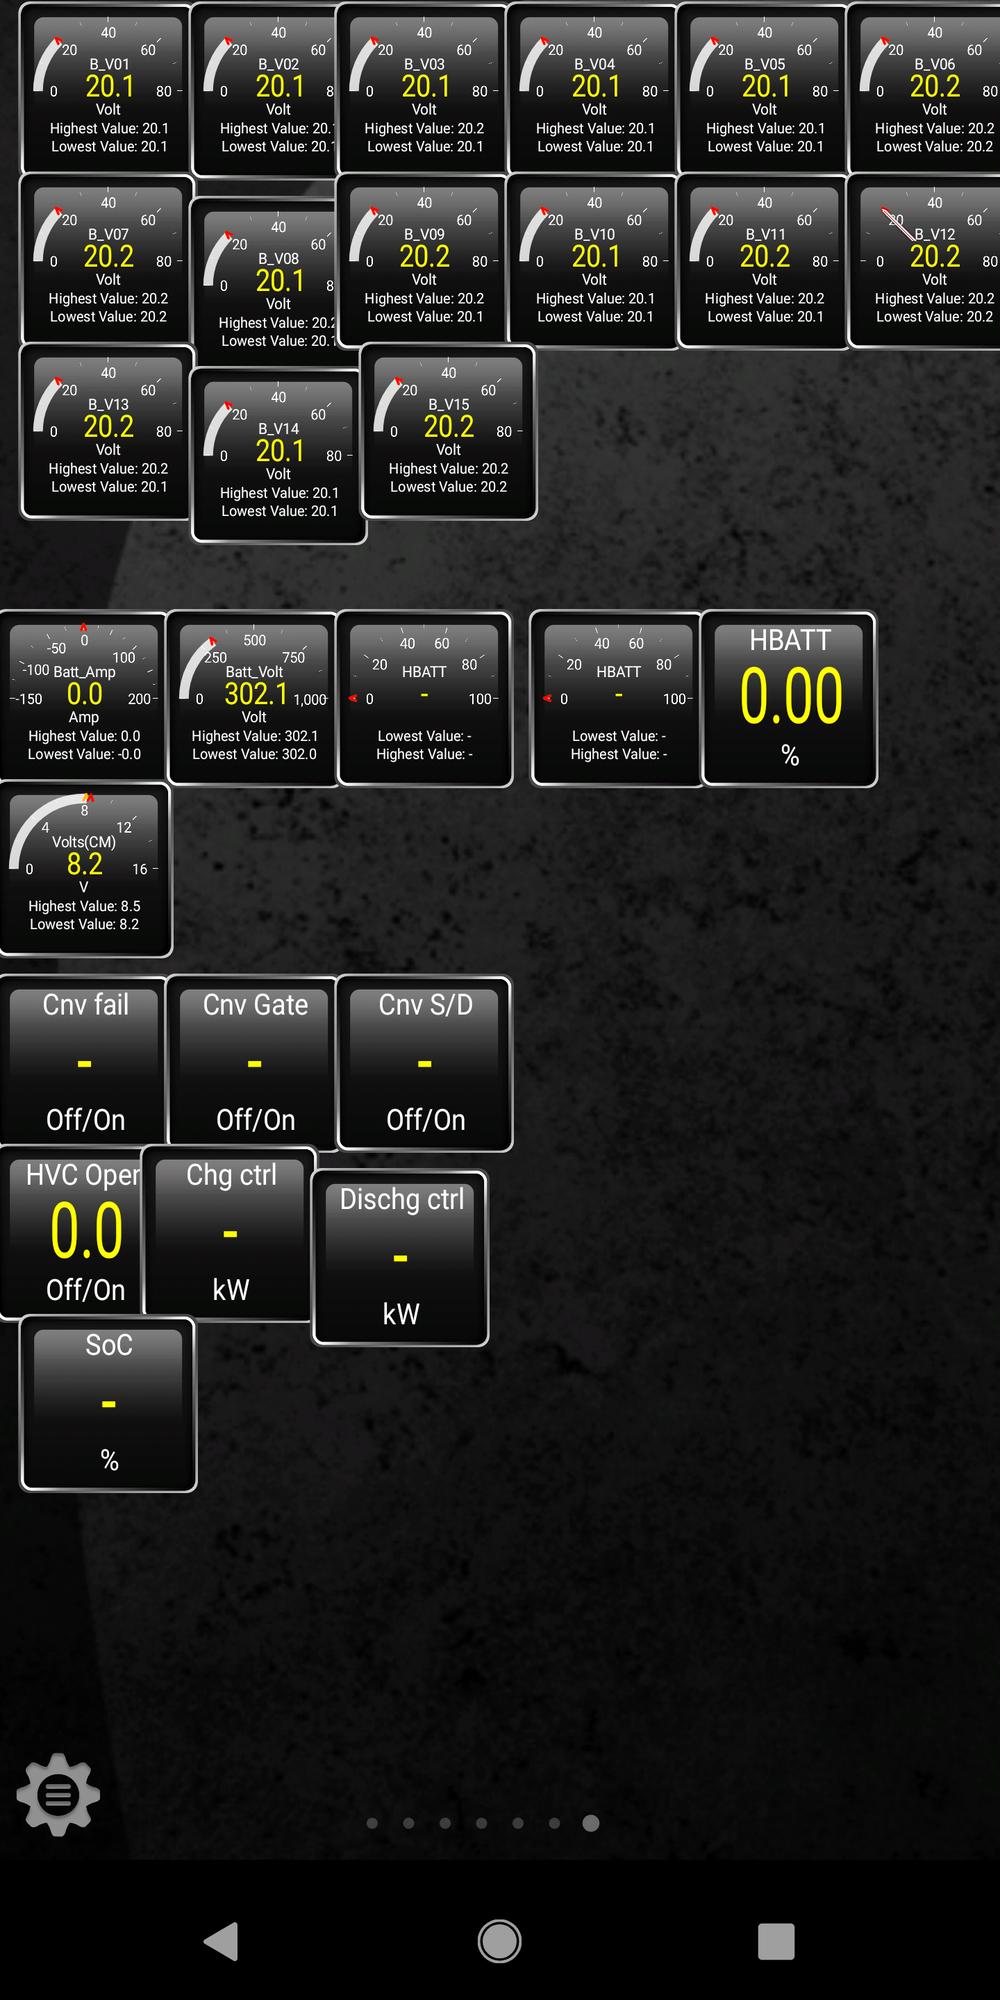 RX400h - Wont Start - Torque Pro Diagnostics - Need Help